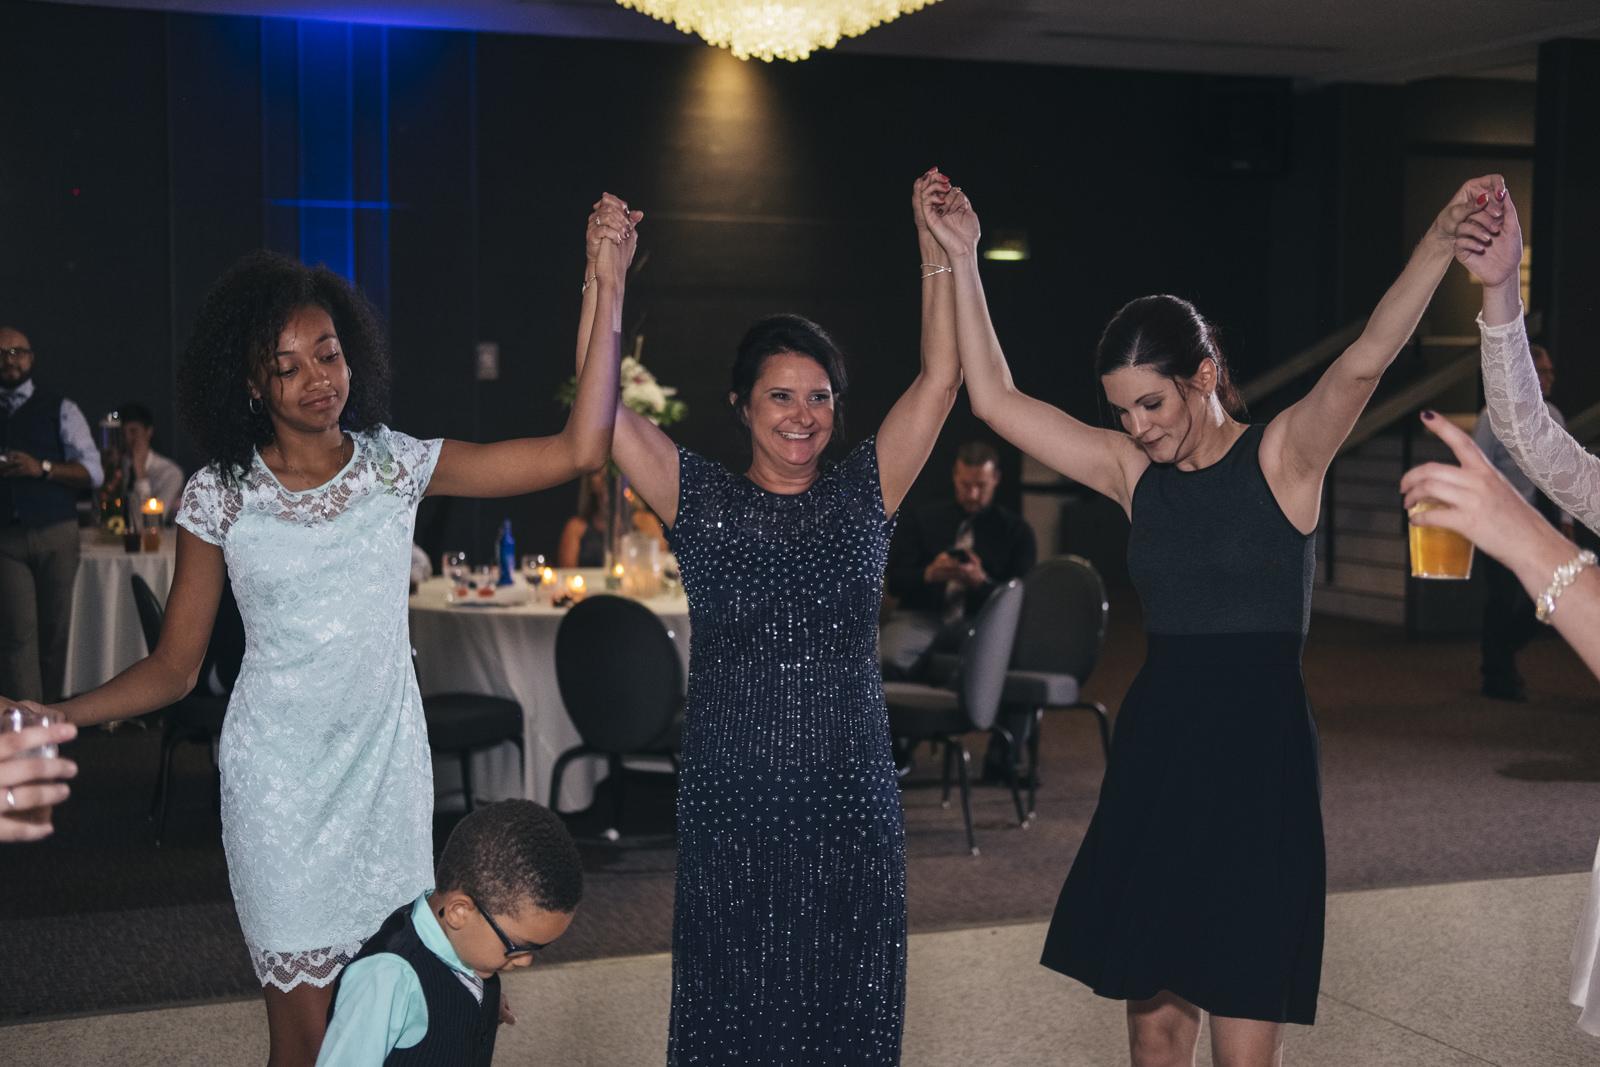 The groom's stepmom dances at his wedding reception in Toledo, Ohio.